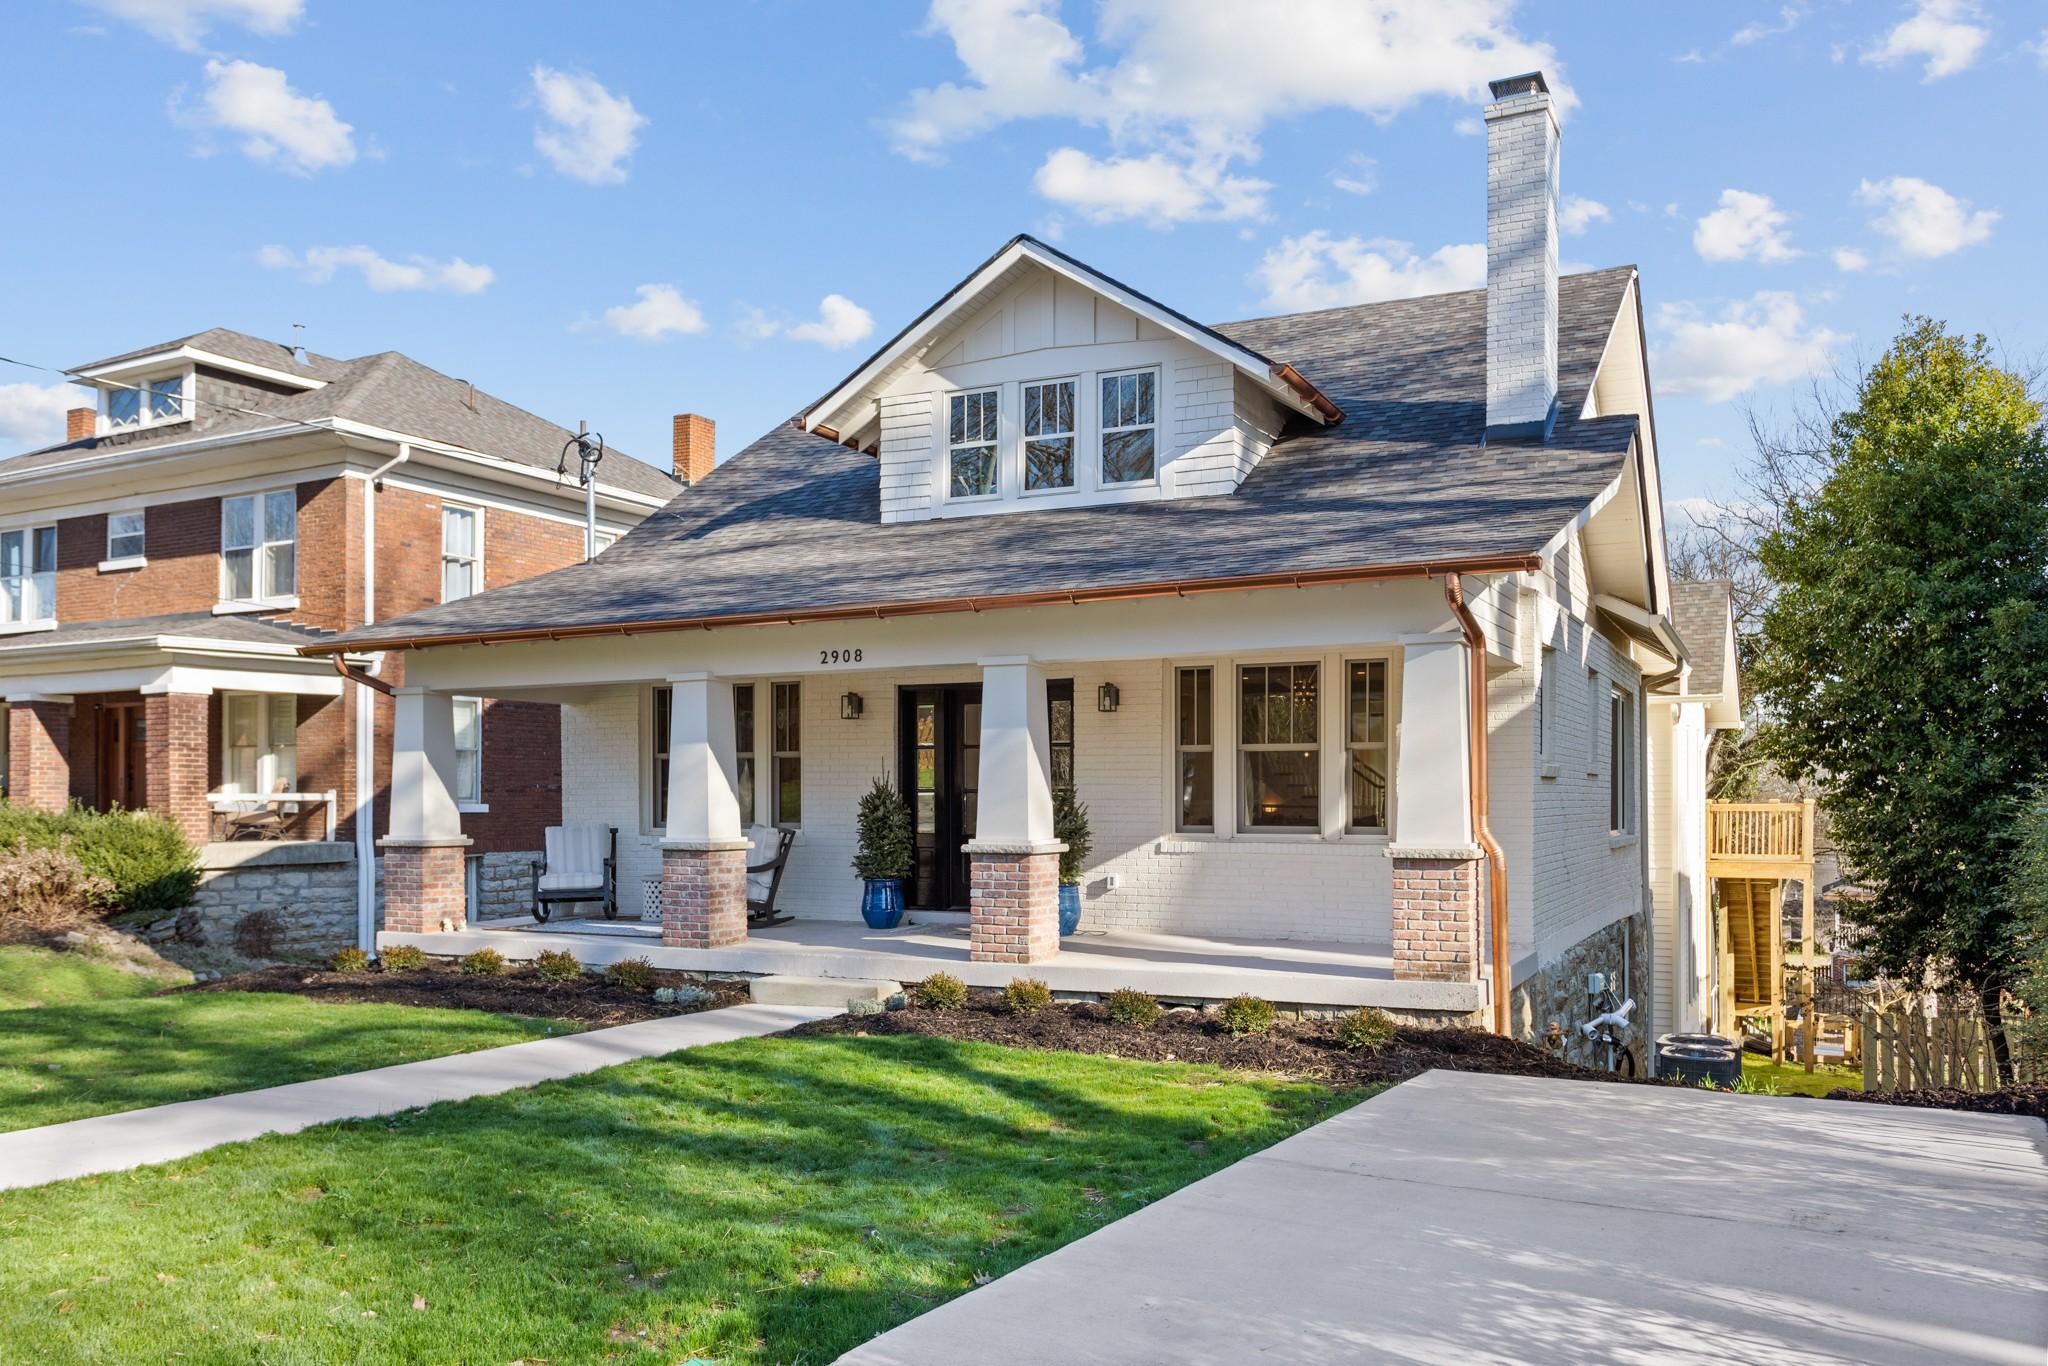 2908 Oakland Ave, Nashville, TN 37212 - Nashville, TN real estate listing